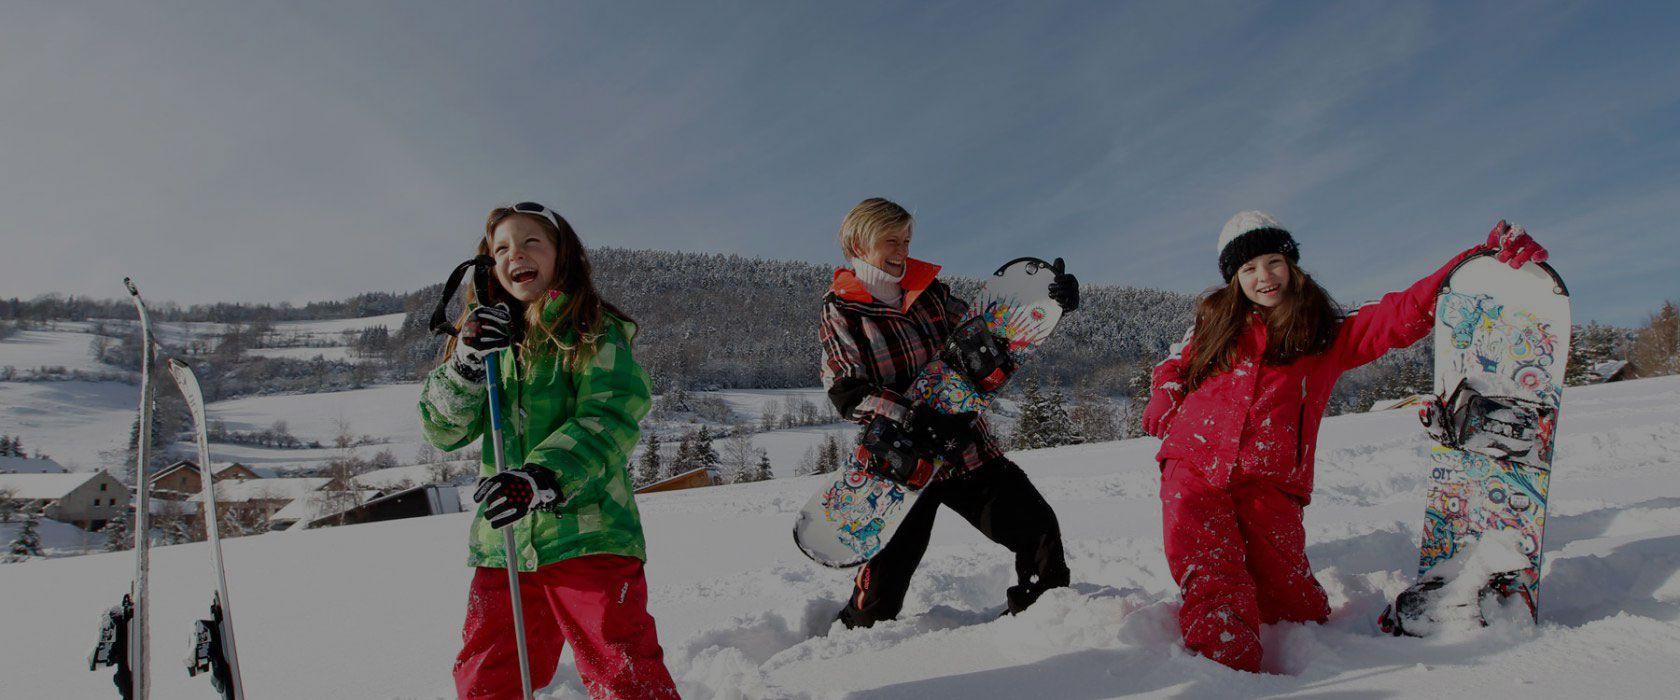 Bien choisir sa station de ski familiale